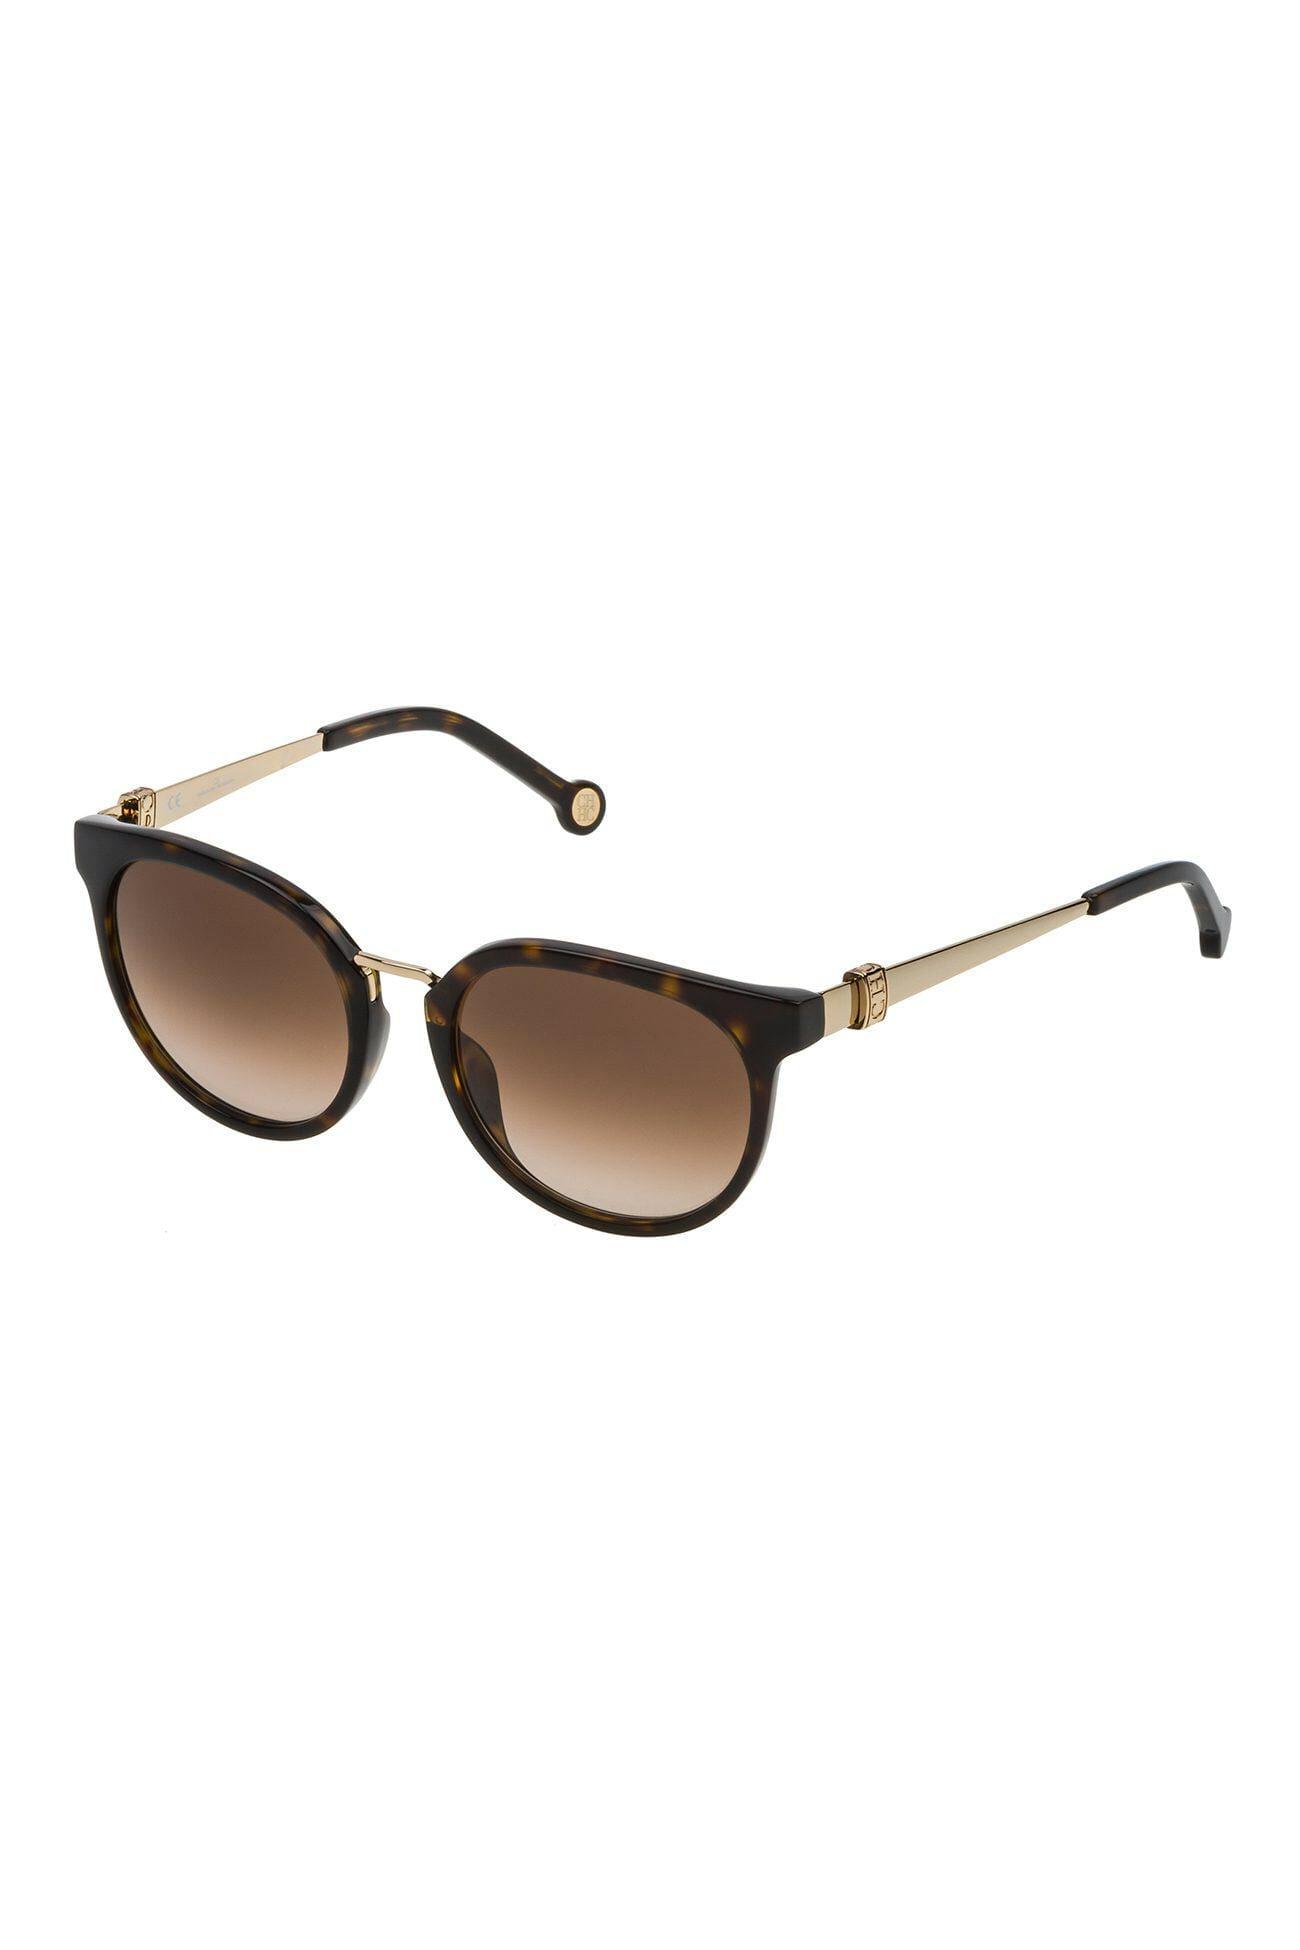 CH-Carolina-Herrera-Eyewear-Reference722-01